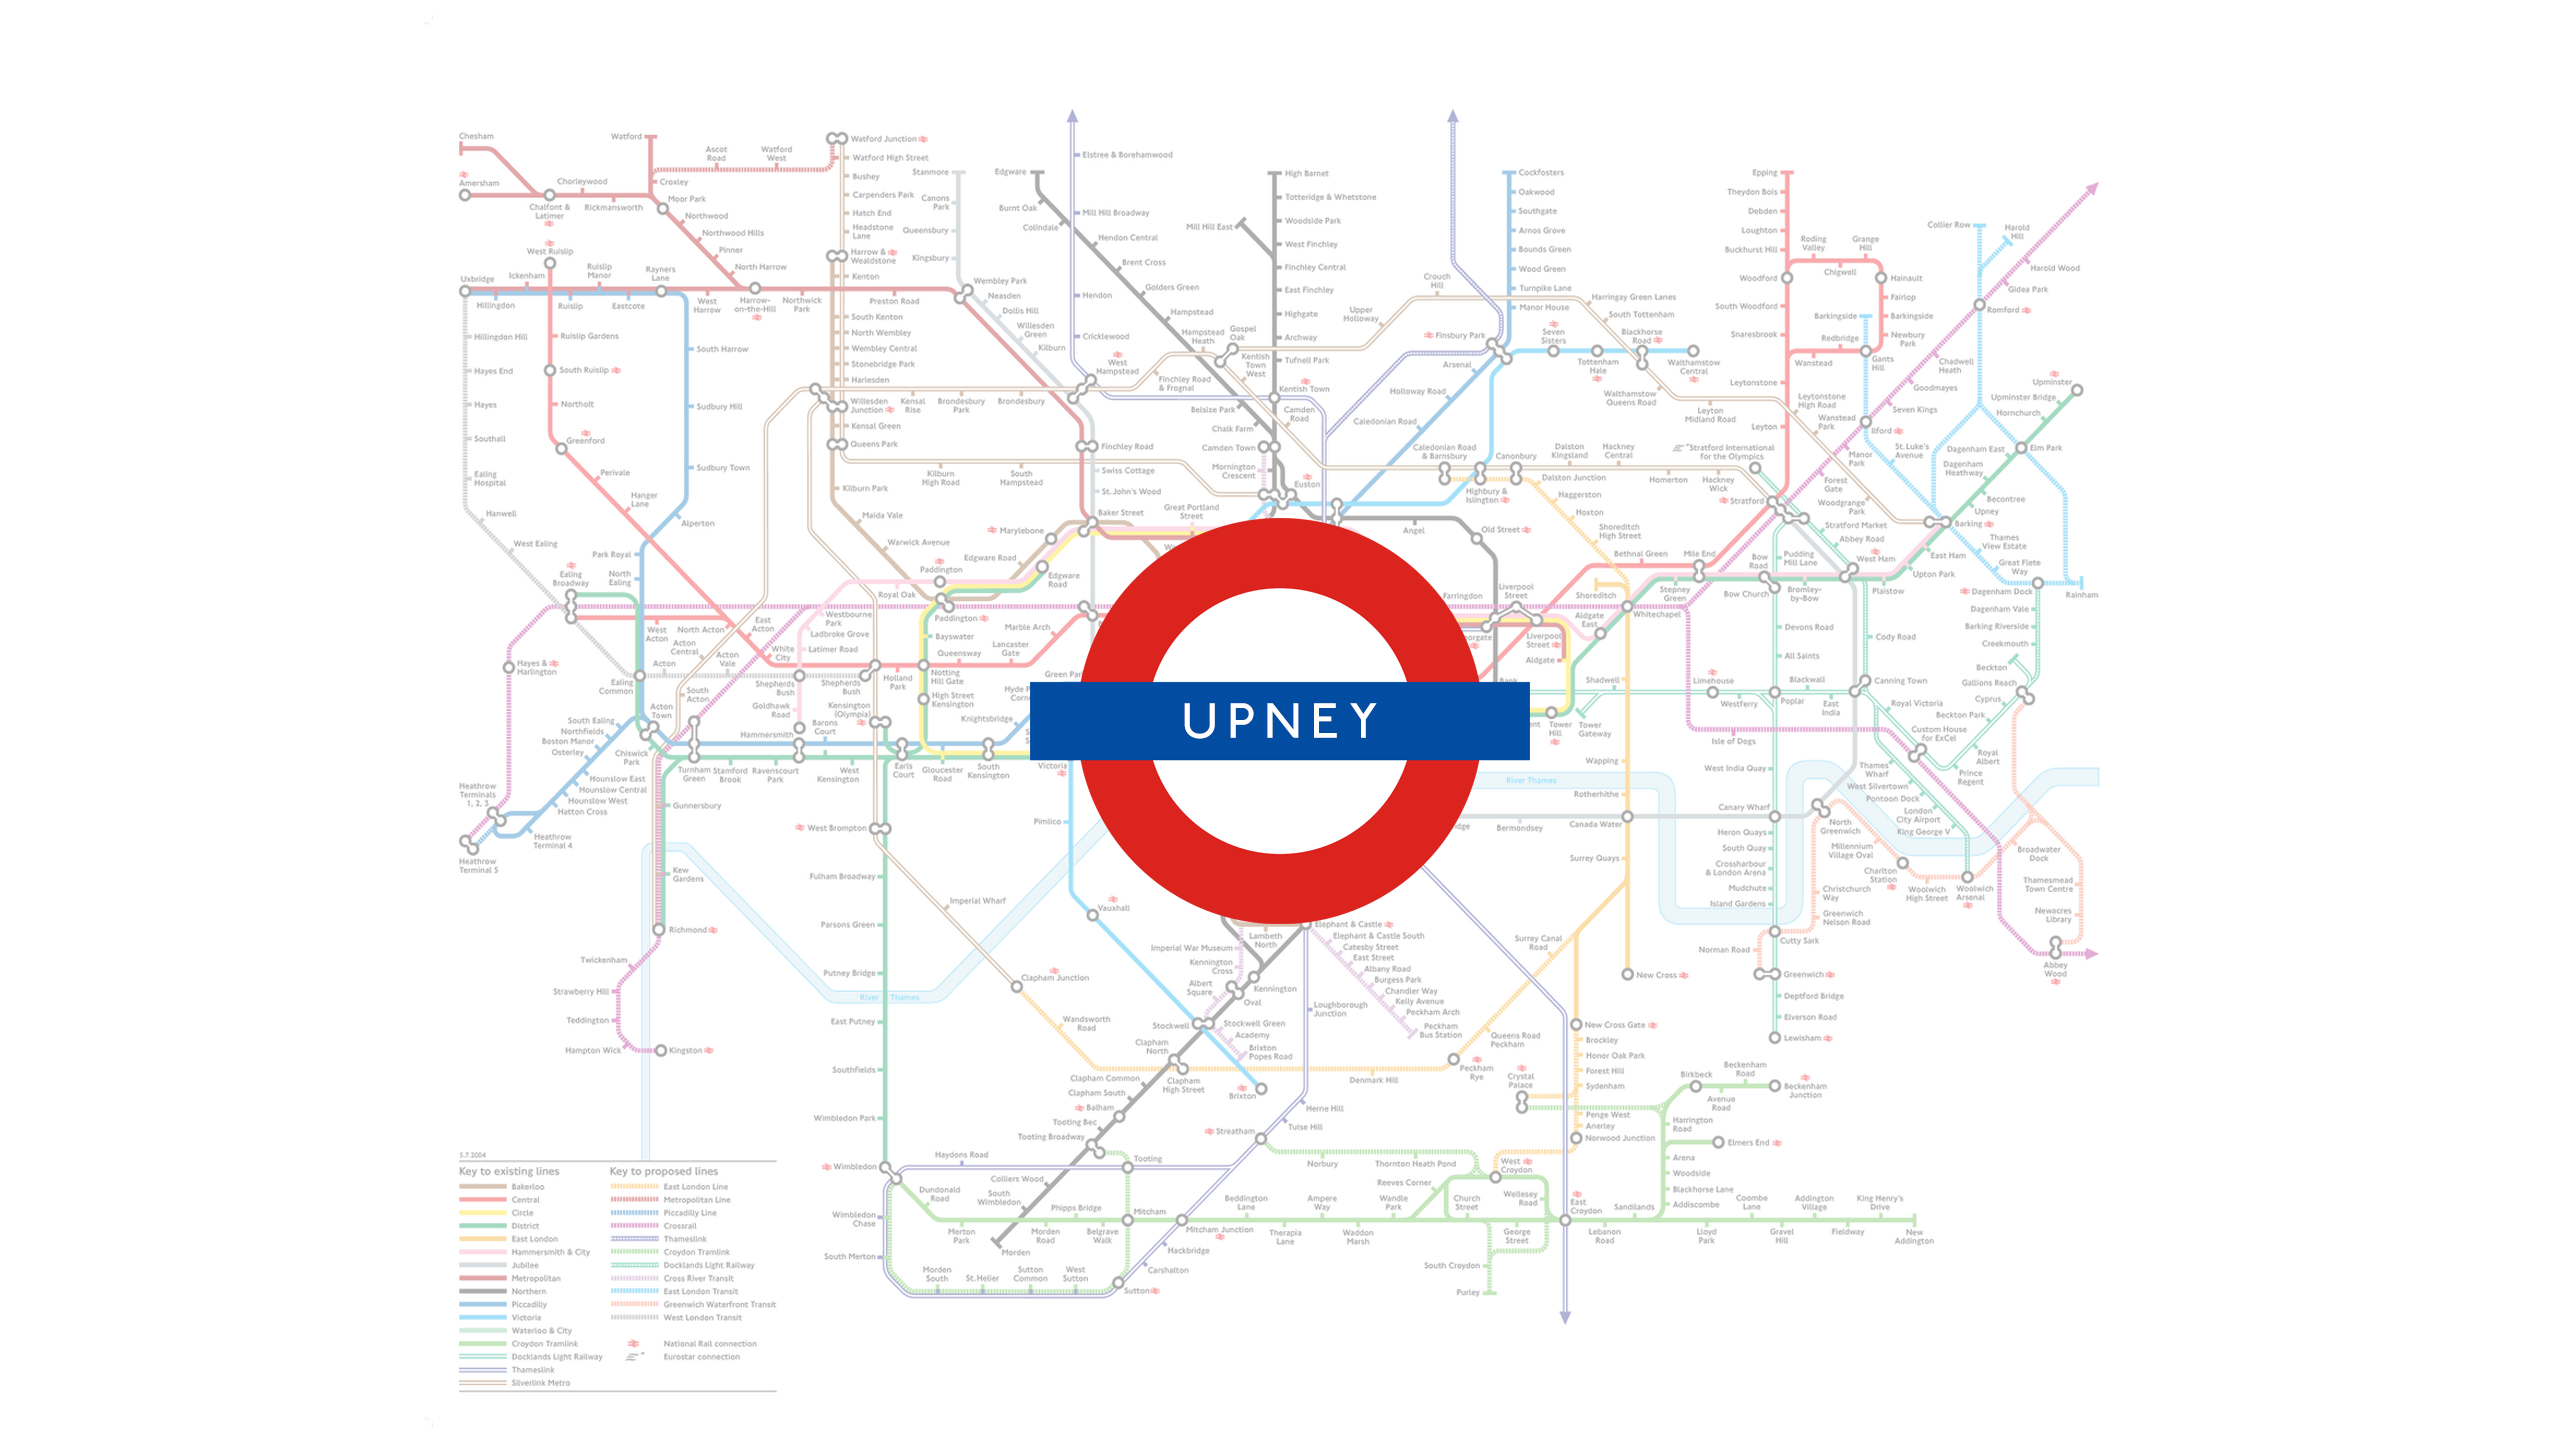 Upney (Map)